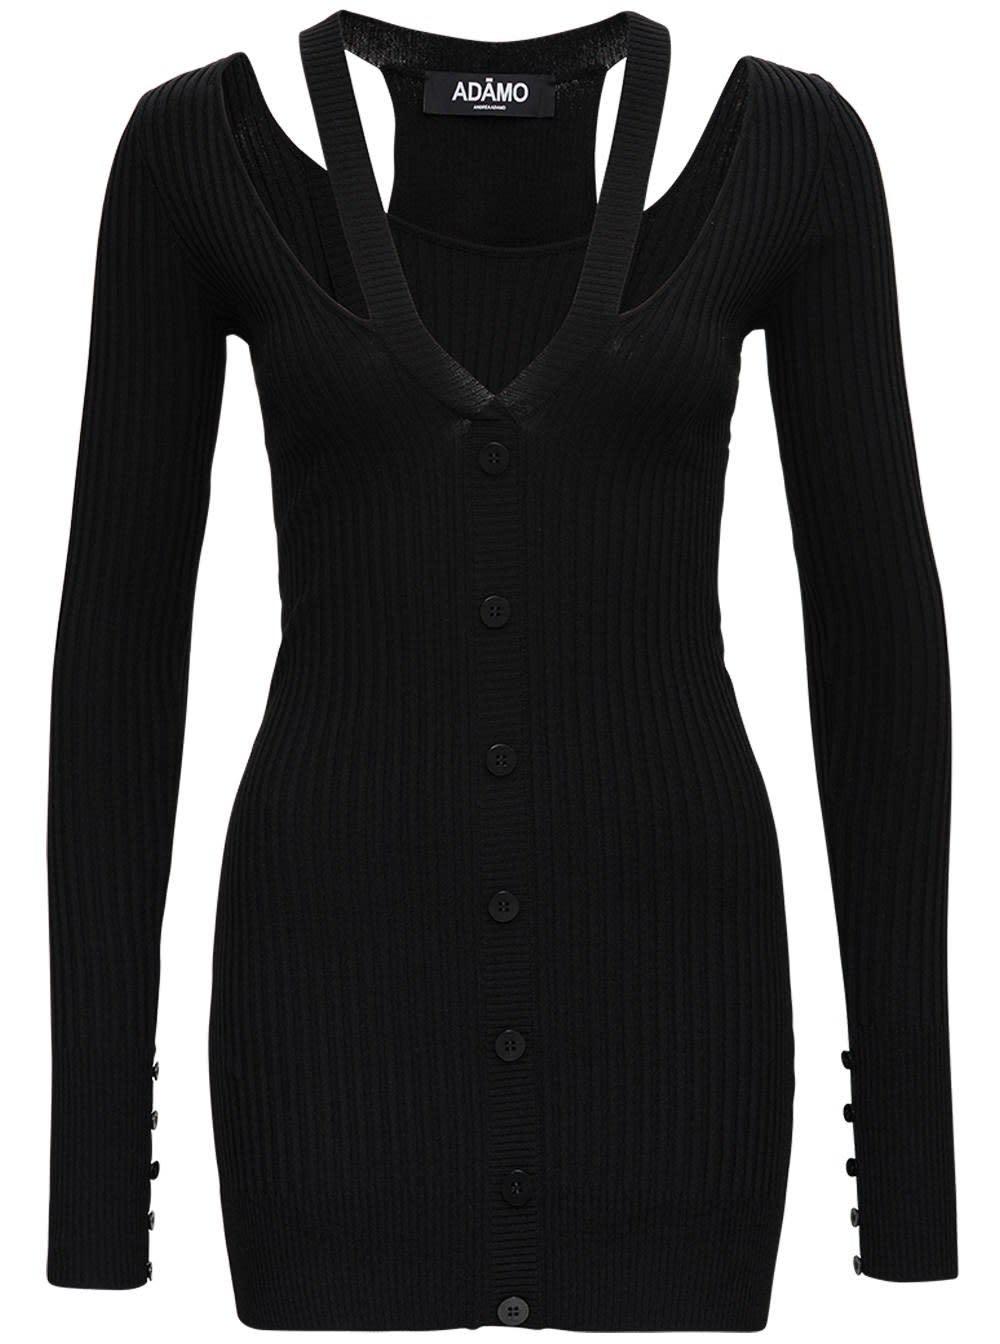 Black Ribbed Knit Dress